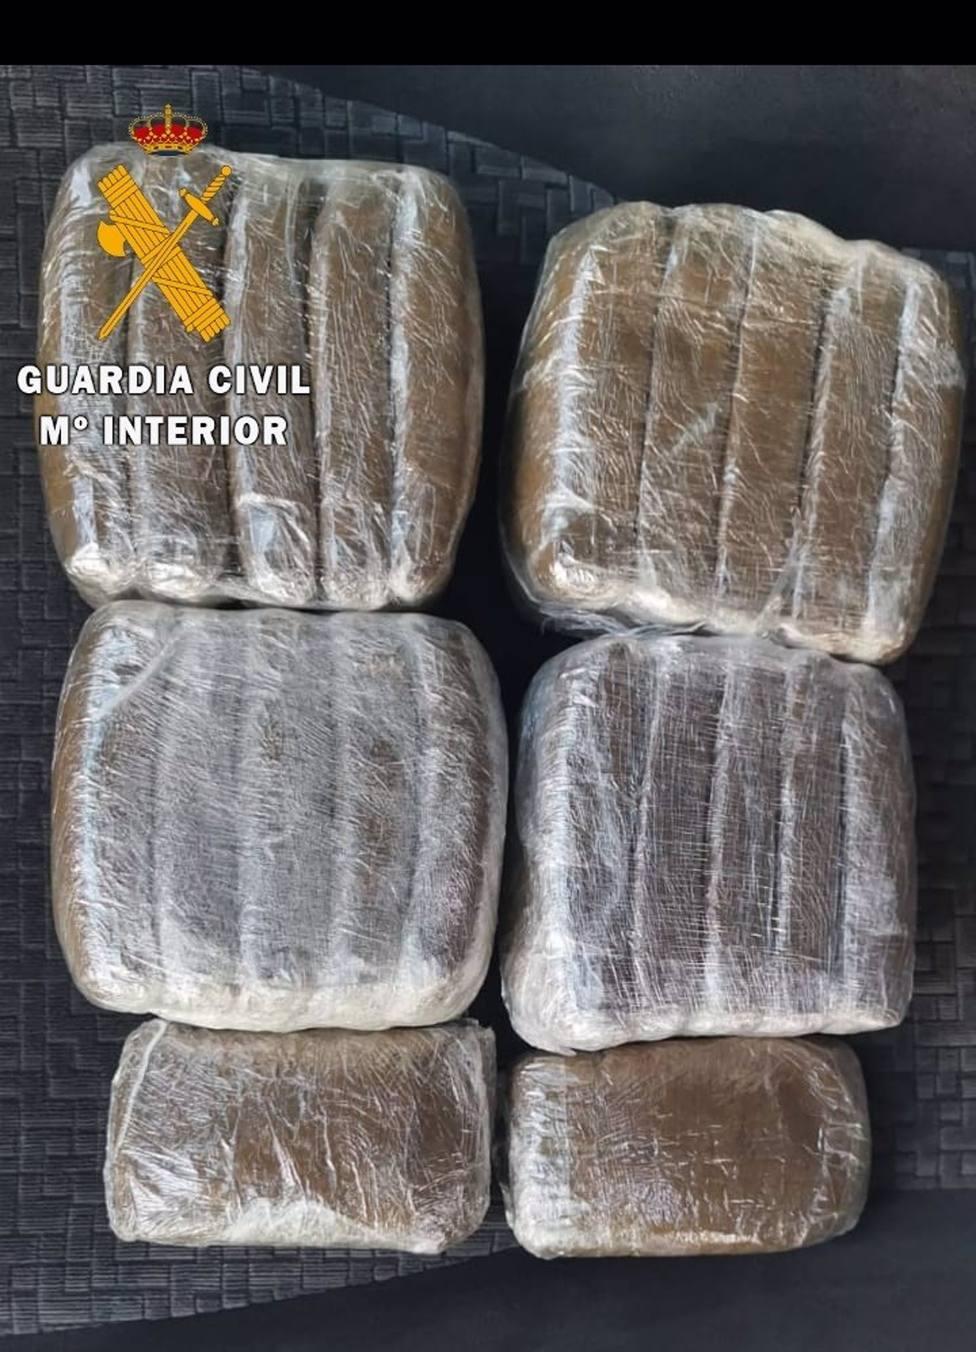 Droga incautada por la Guardia Civil a los tres detenidos